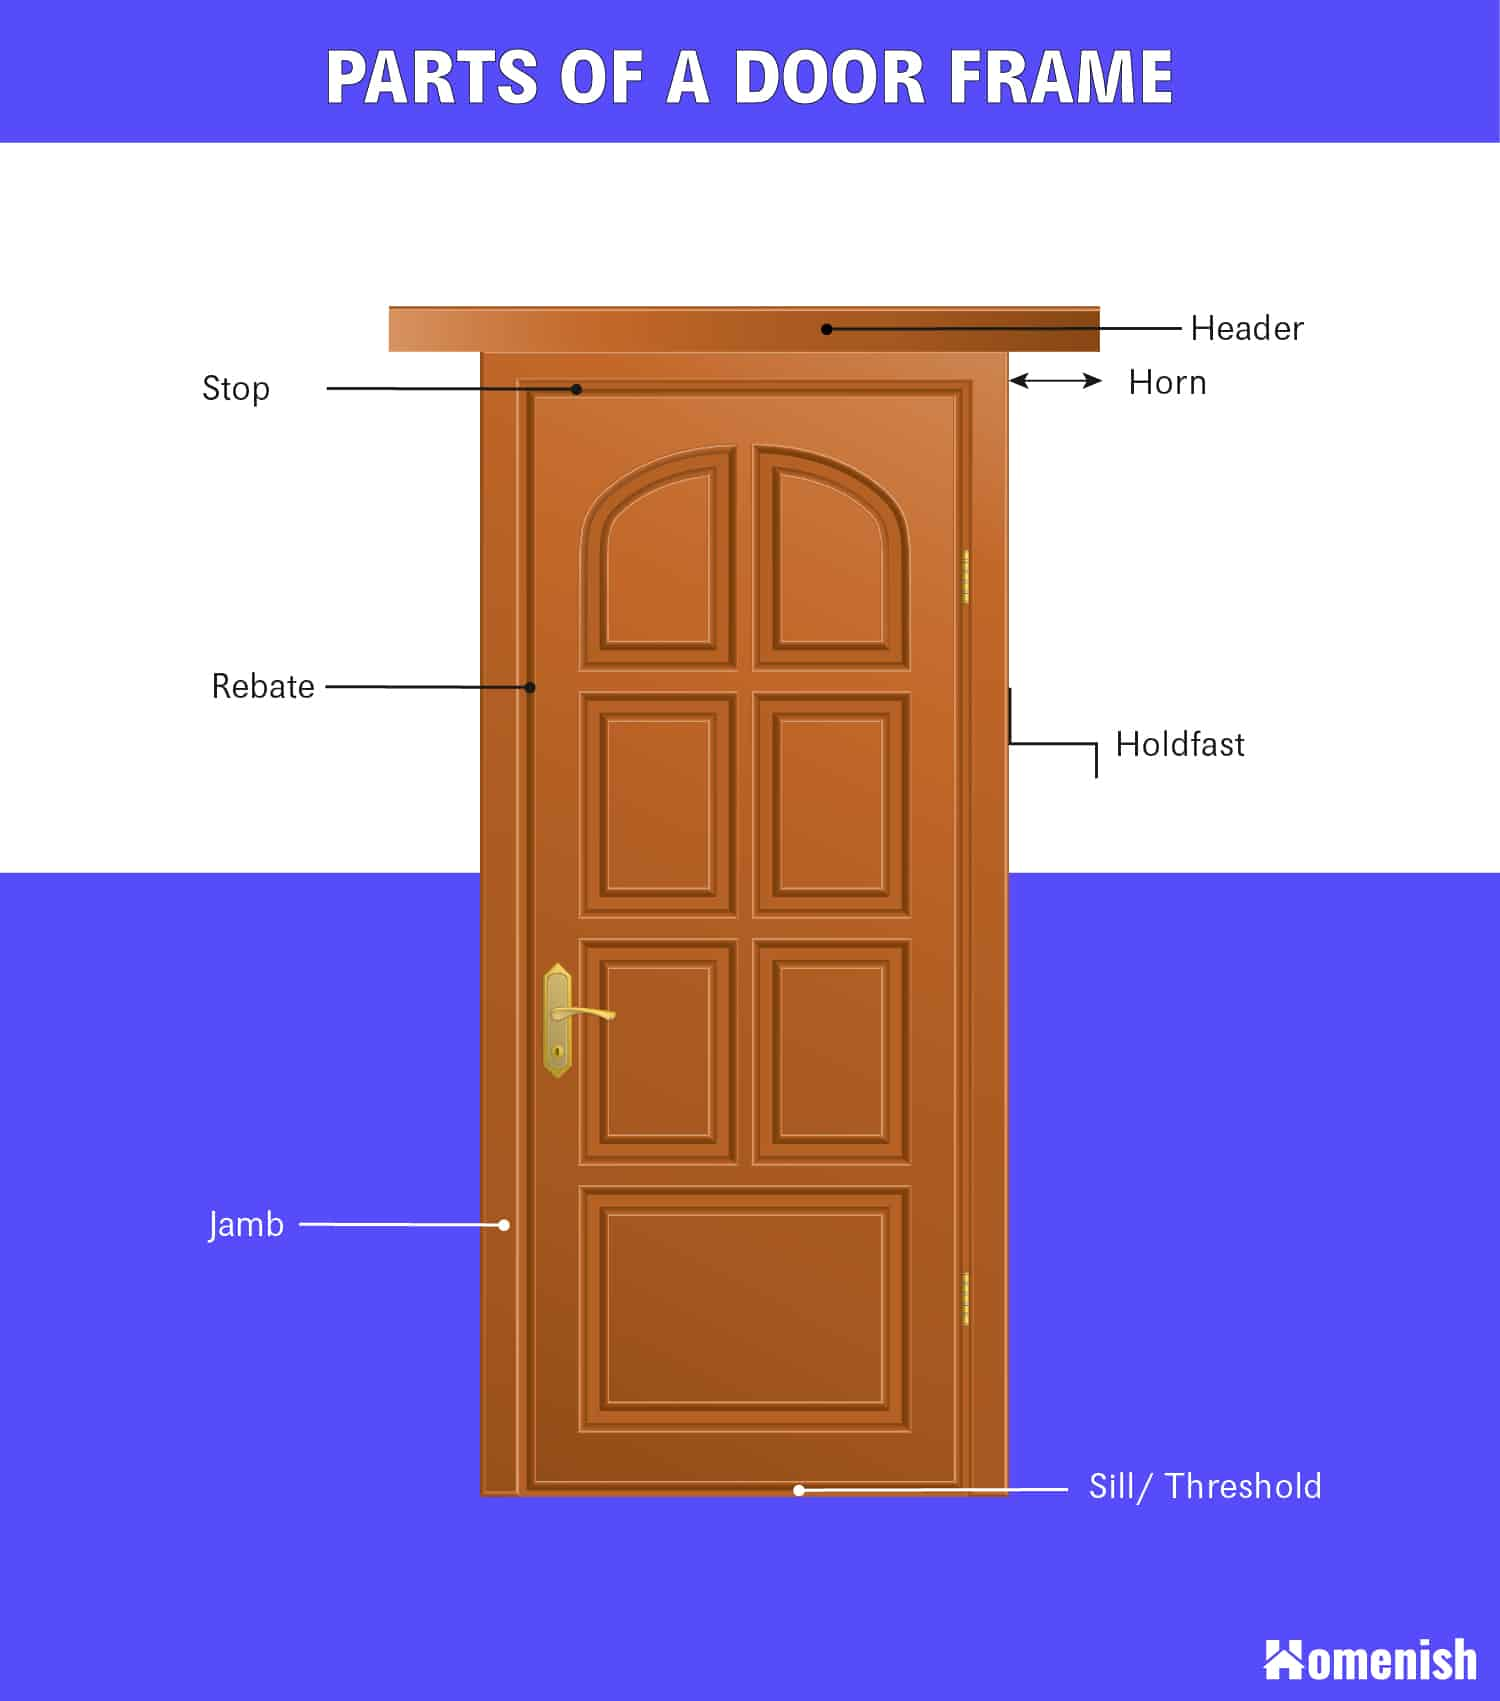 Parts of a Door Frame Diagram